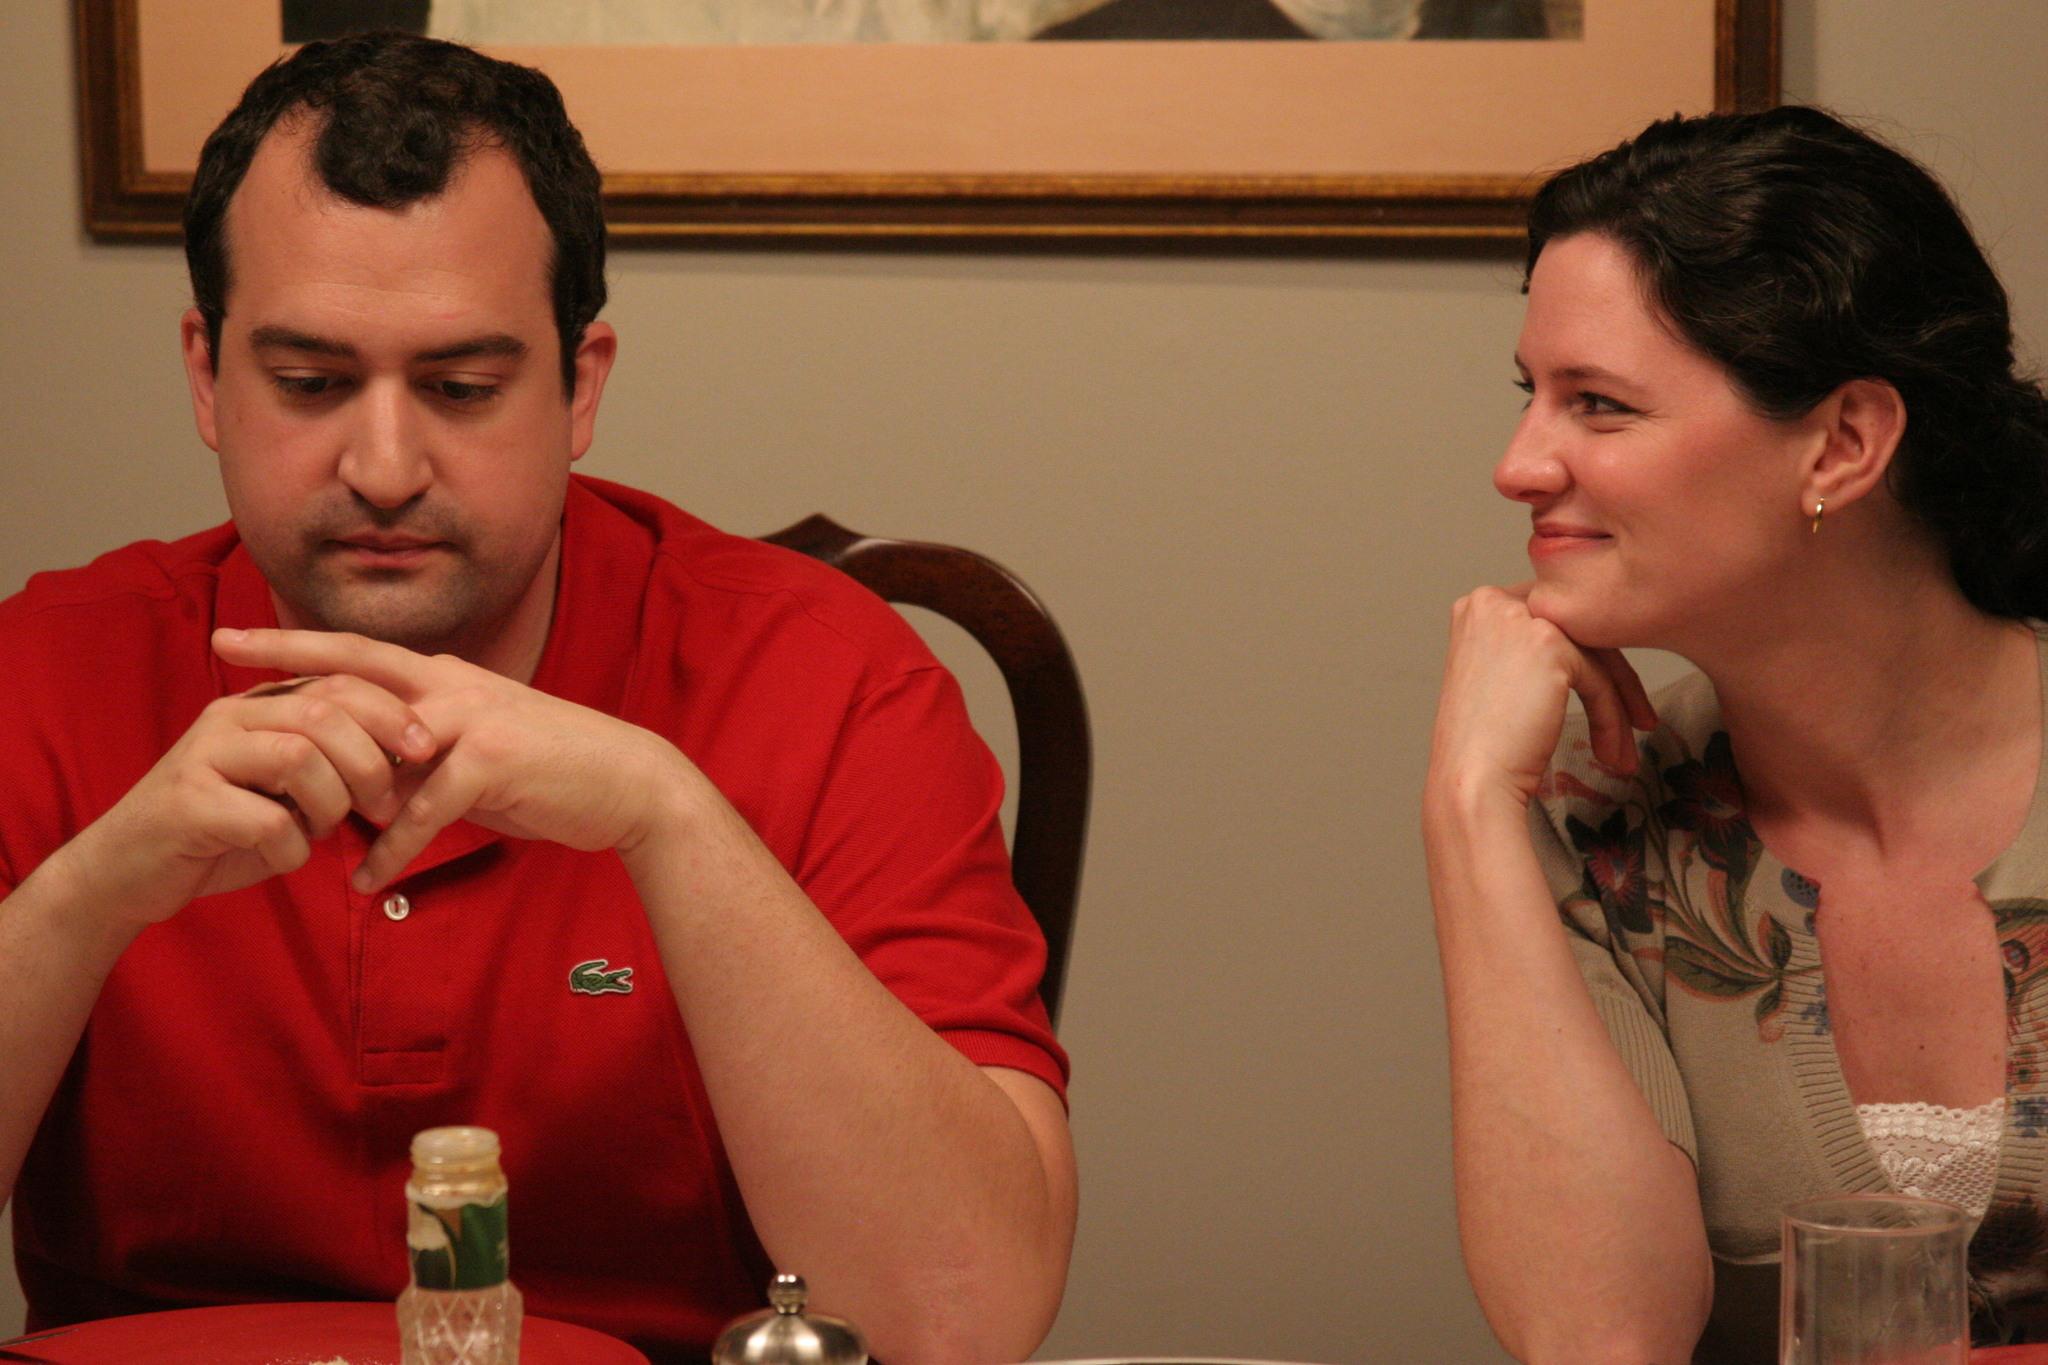 Jennifer Lafleur and Steve Zissis in The Do-Deca-Pentathlon (2012)